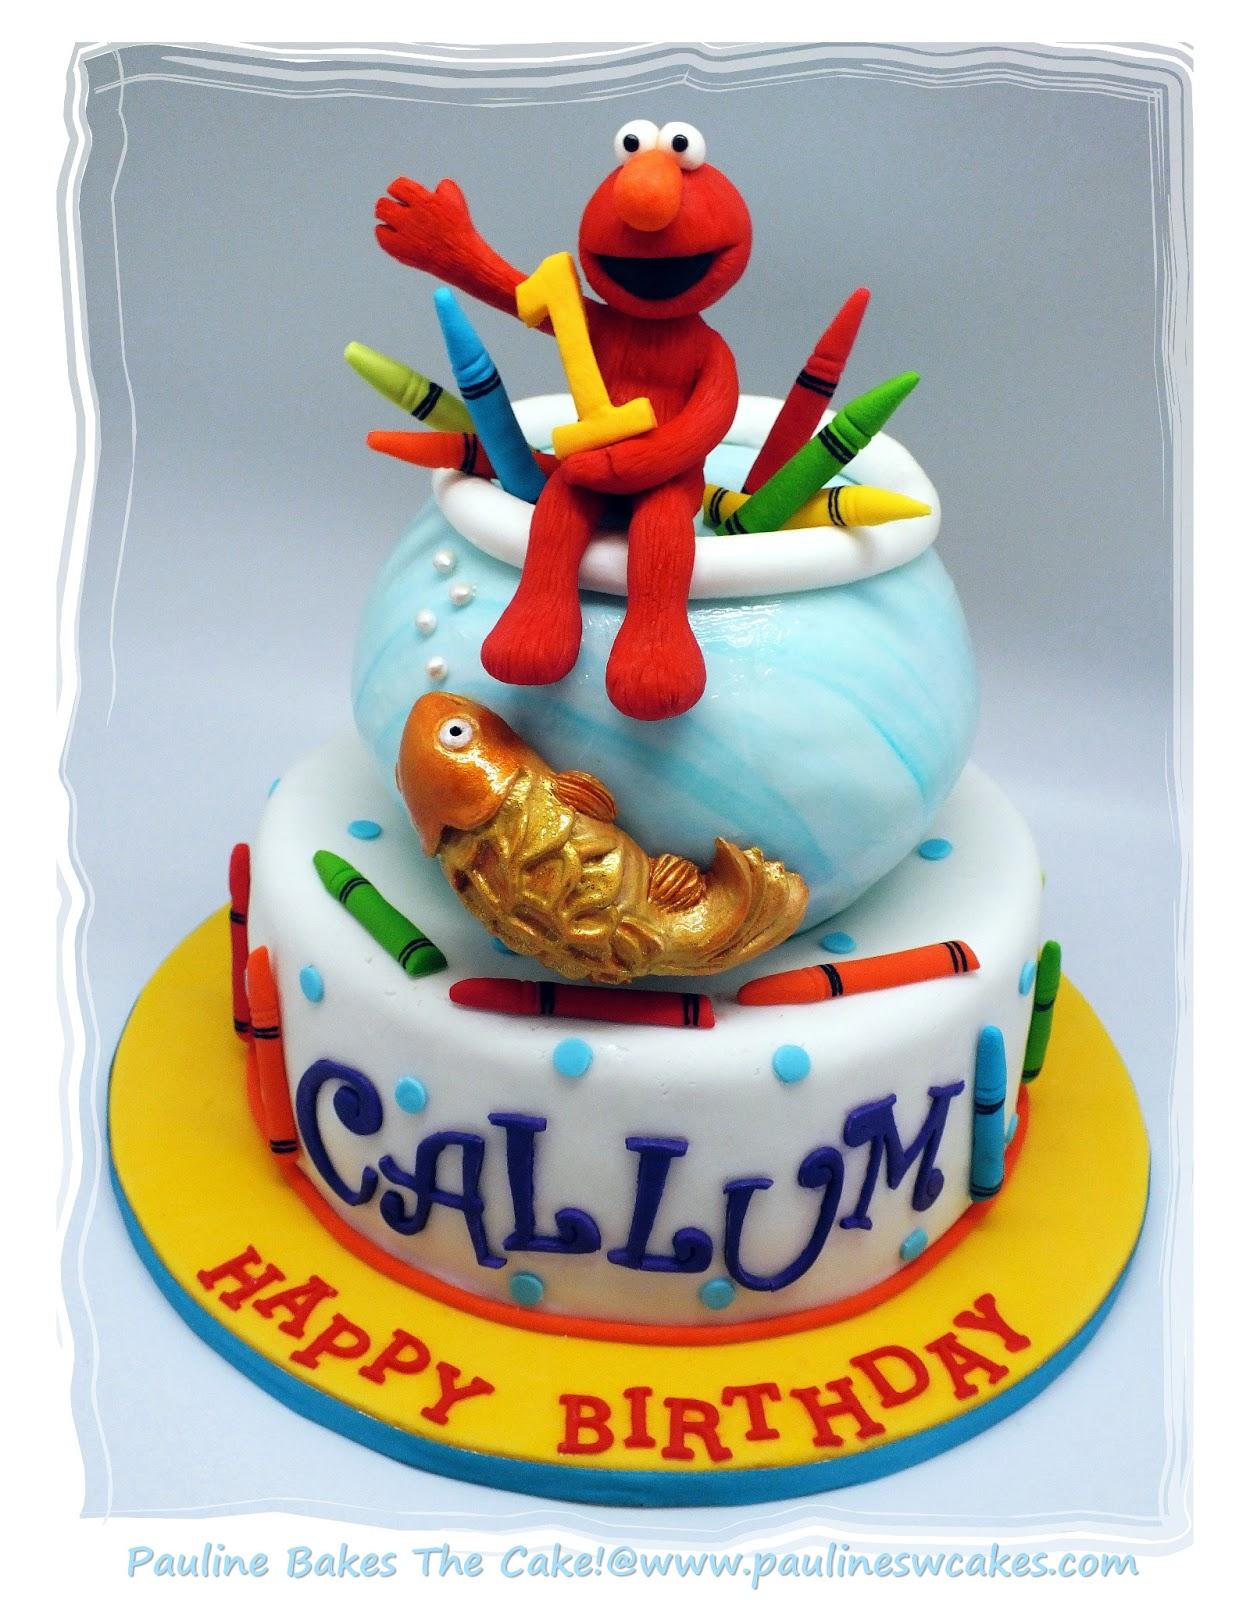 PAULINE BAKES THE CAKE Callums 1st Elmo Cake Elmo Loves His